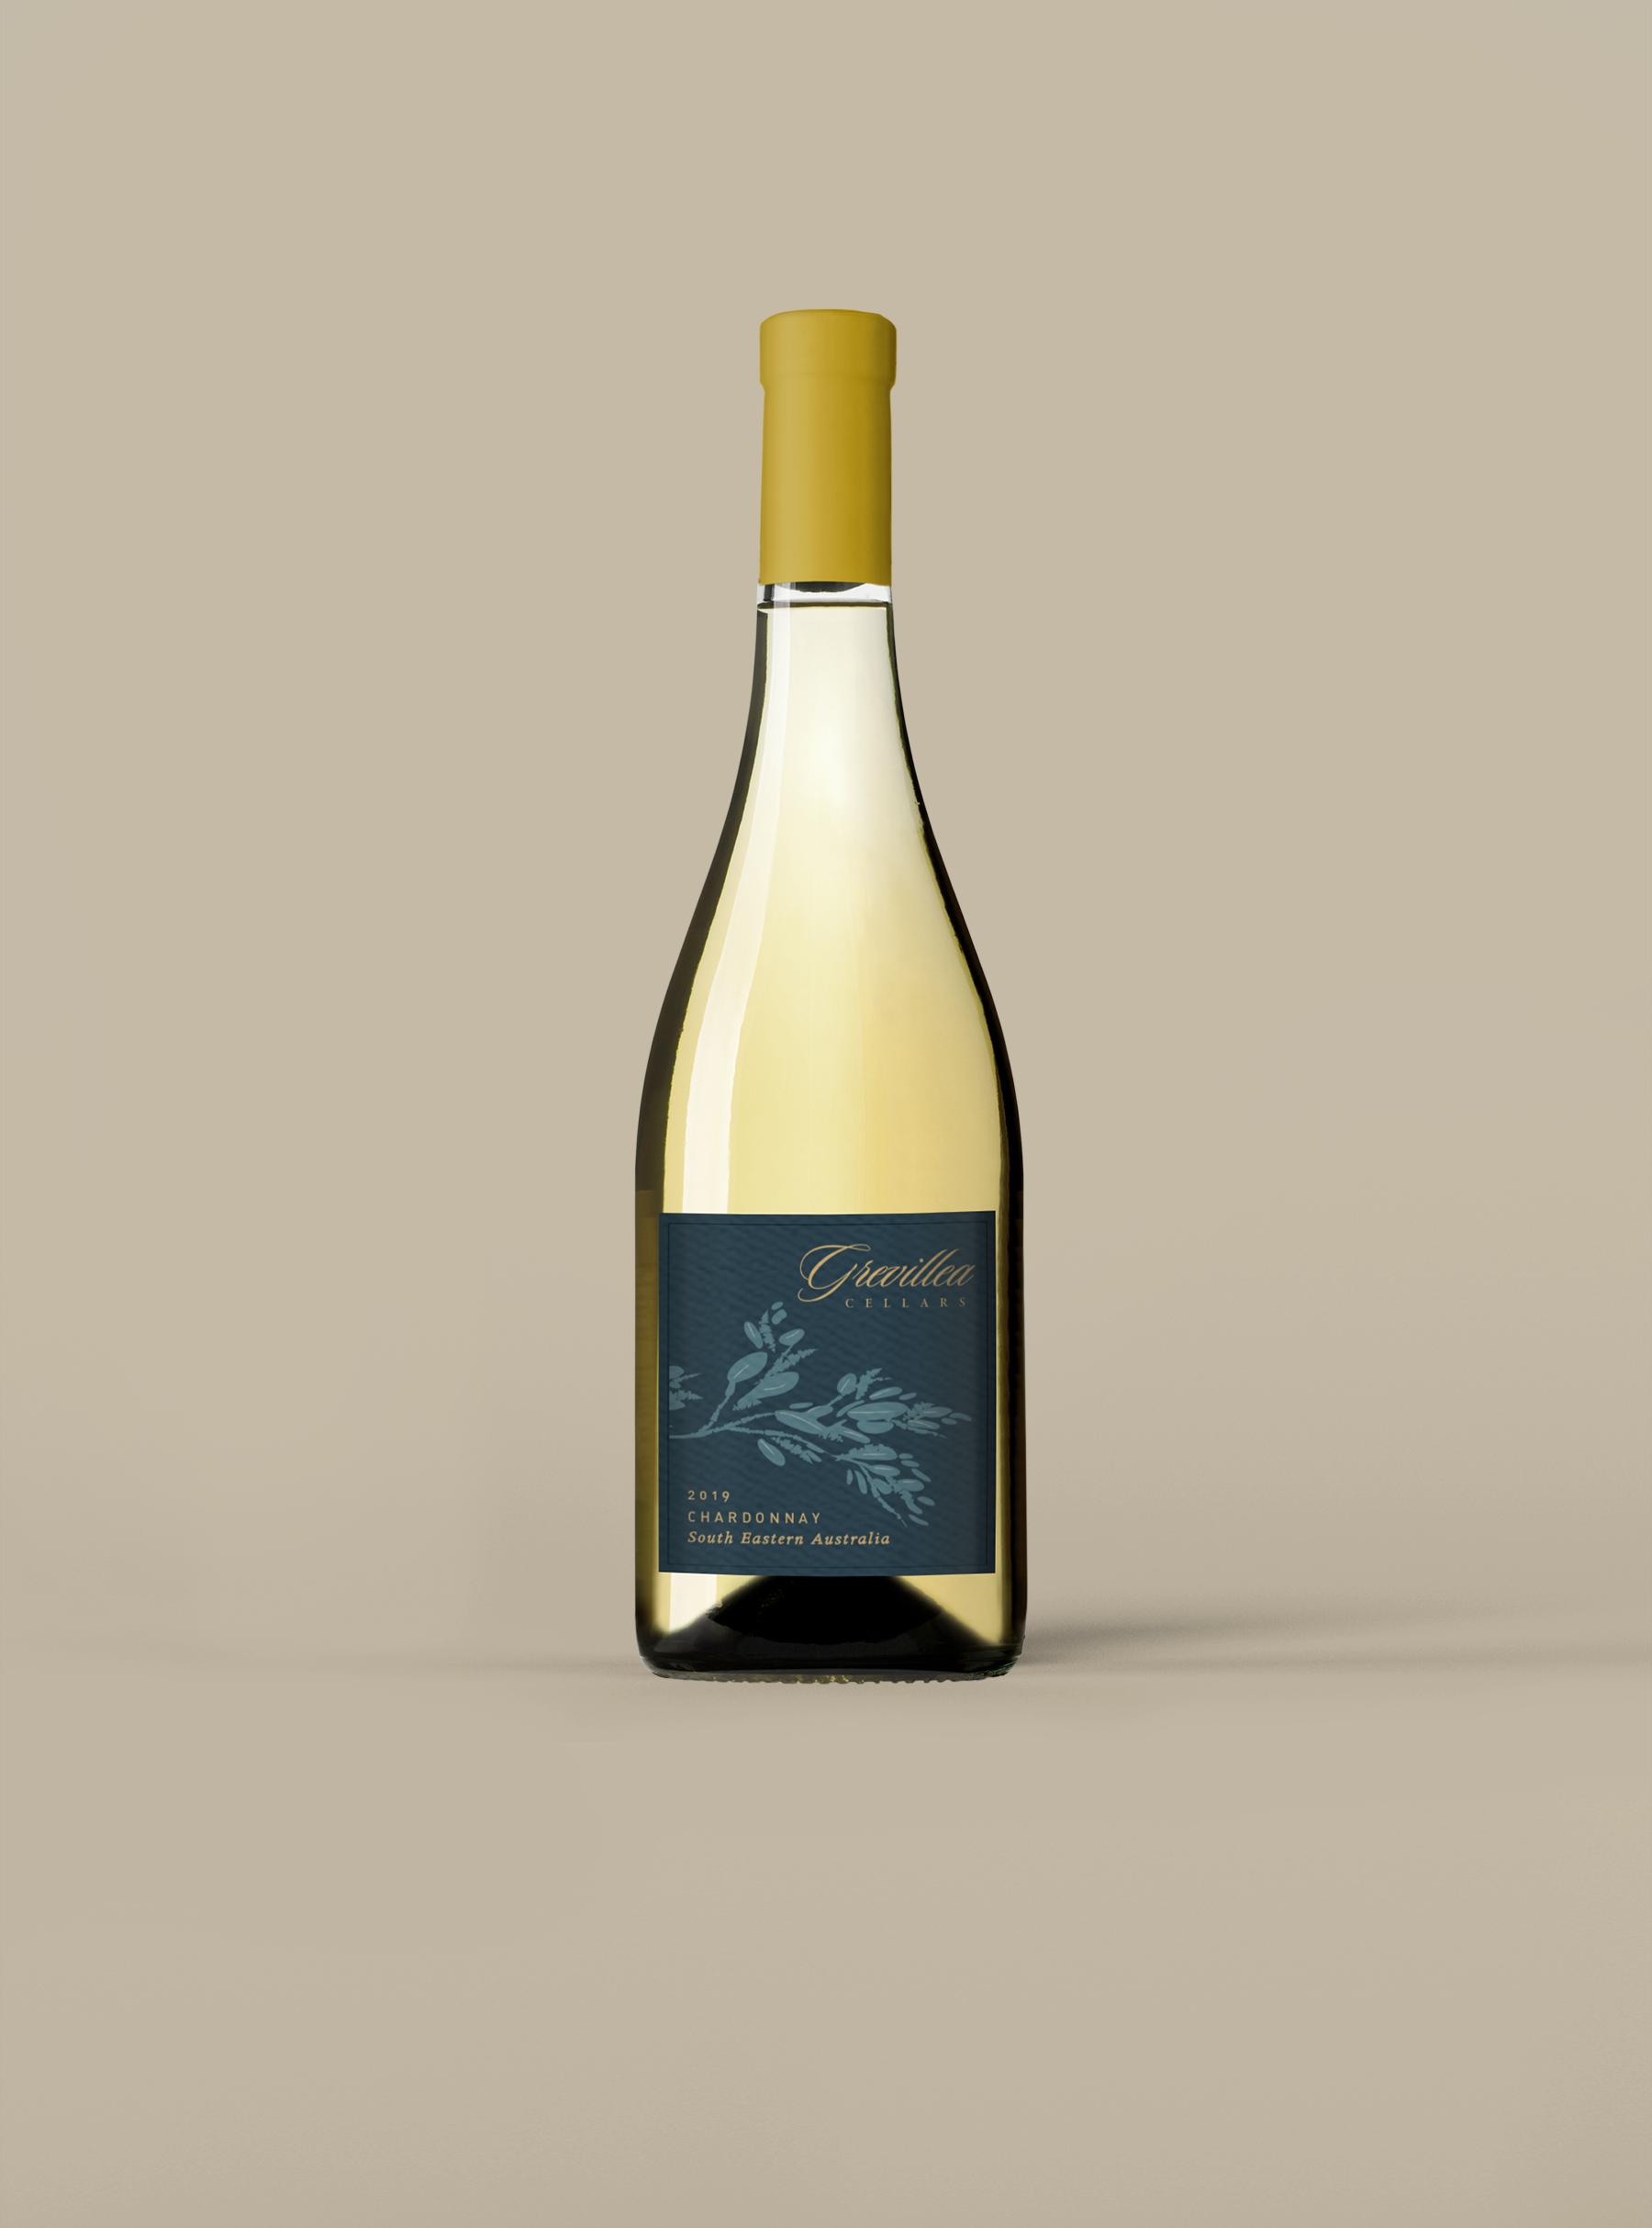 Grevillea Cellars Chardonnay South Eastern Australia